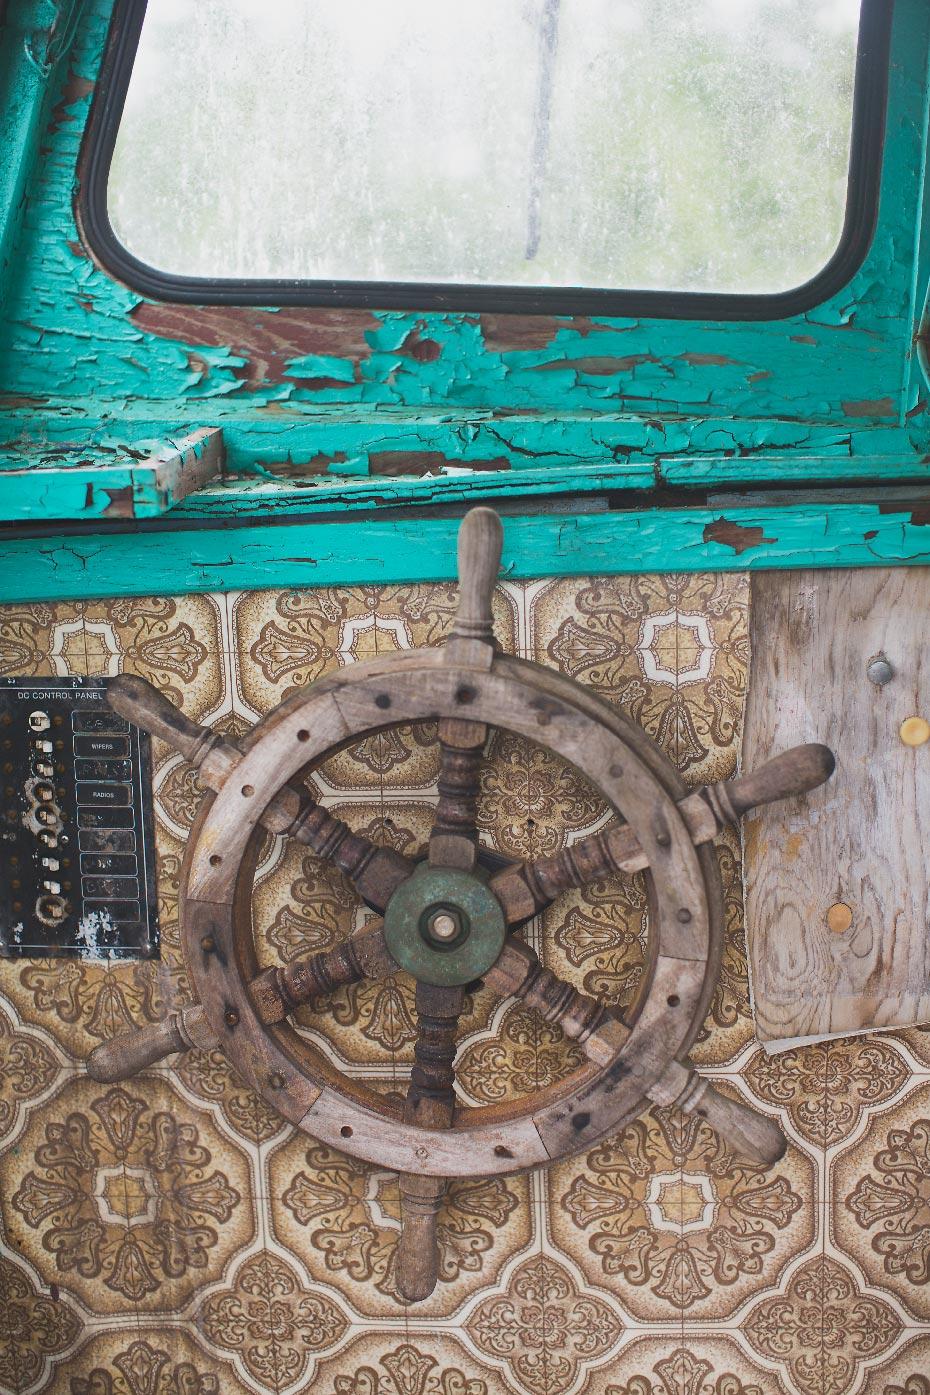 Stacey Van Berkel Photography I Ships wheel I Teal peeling paint I Nova Scotia, Canada